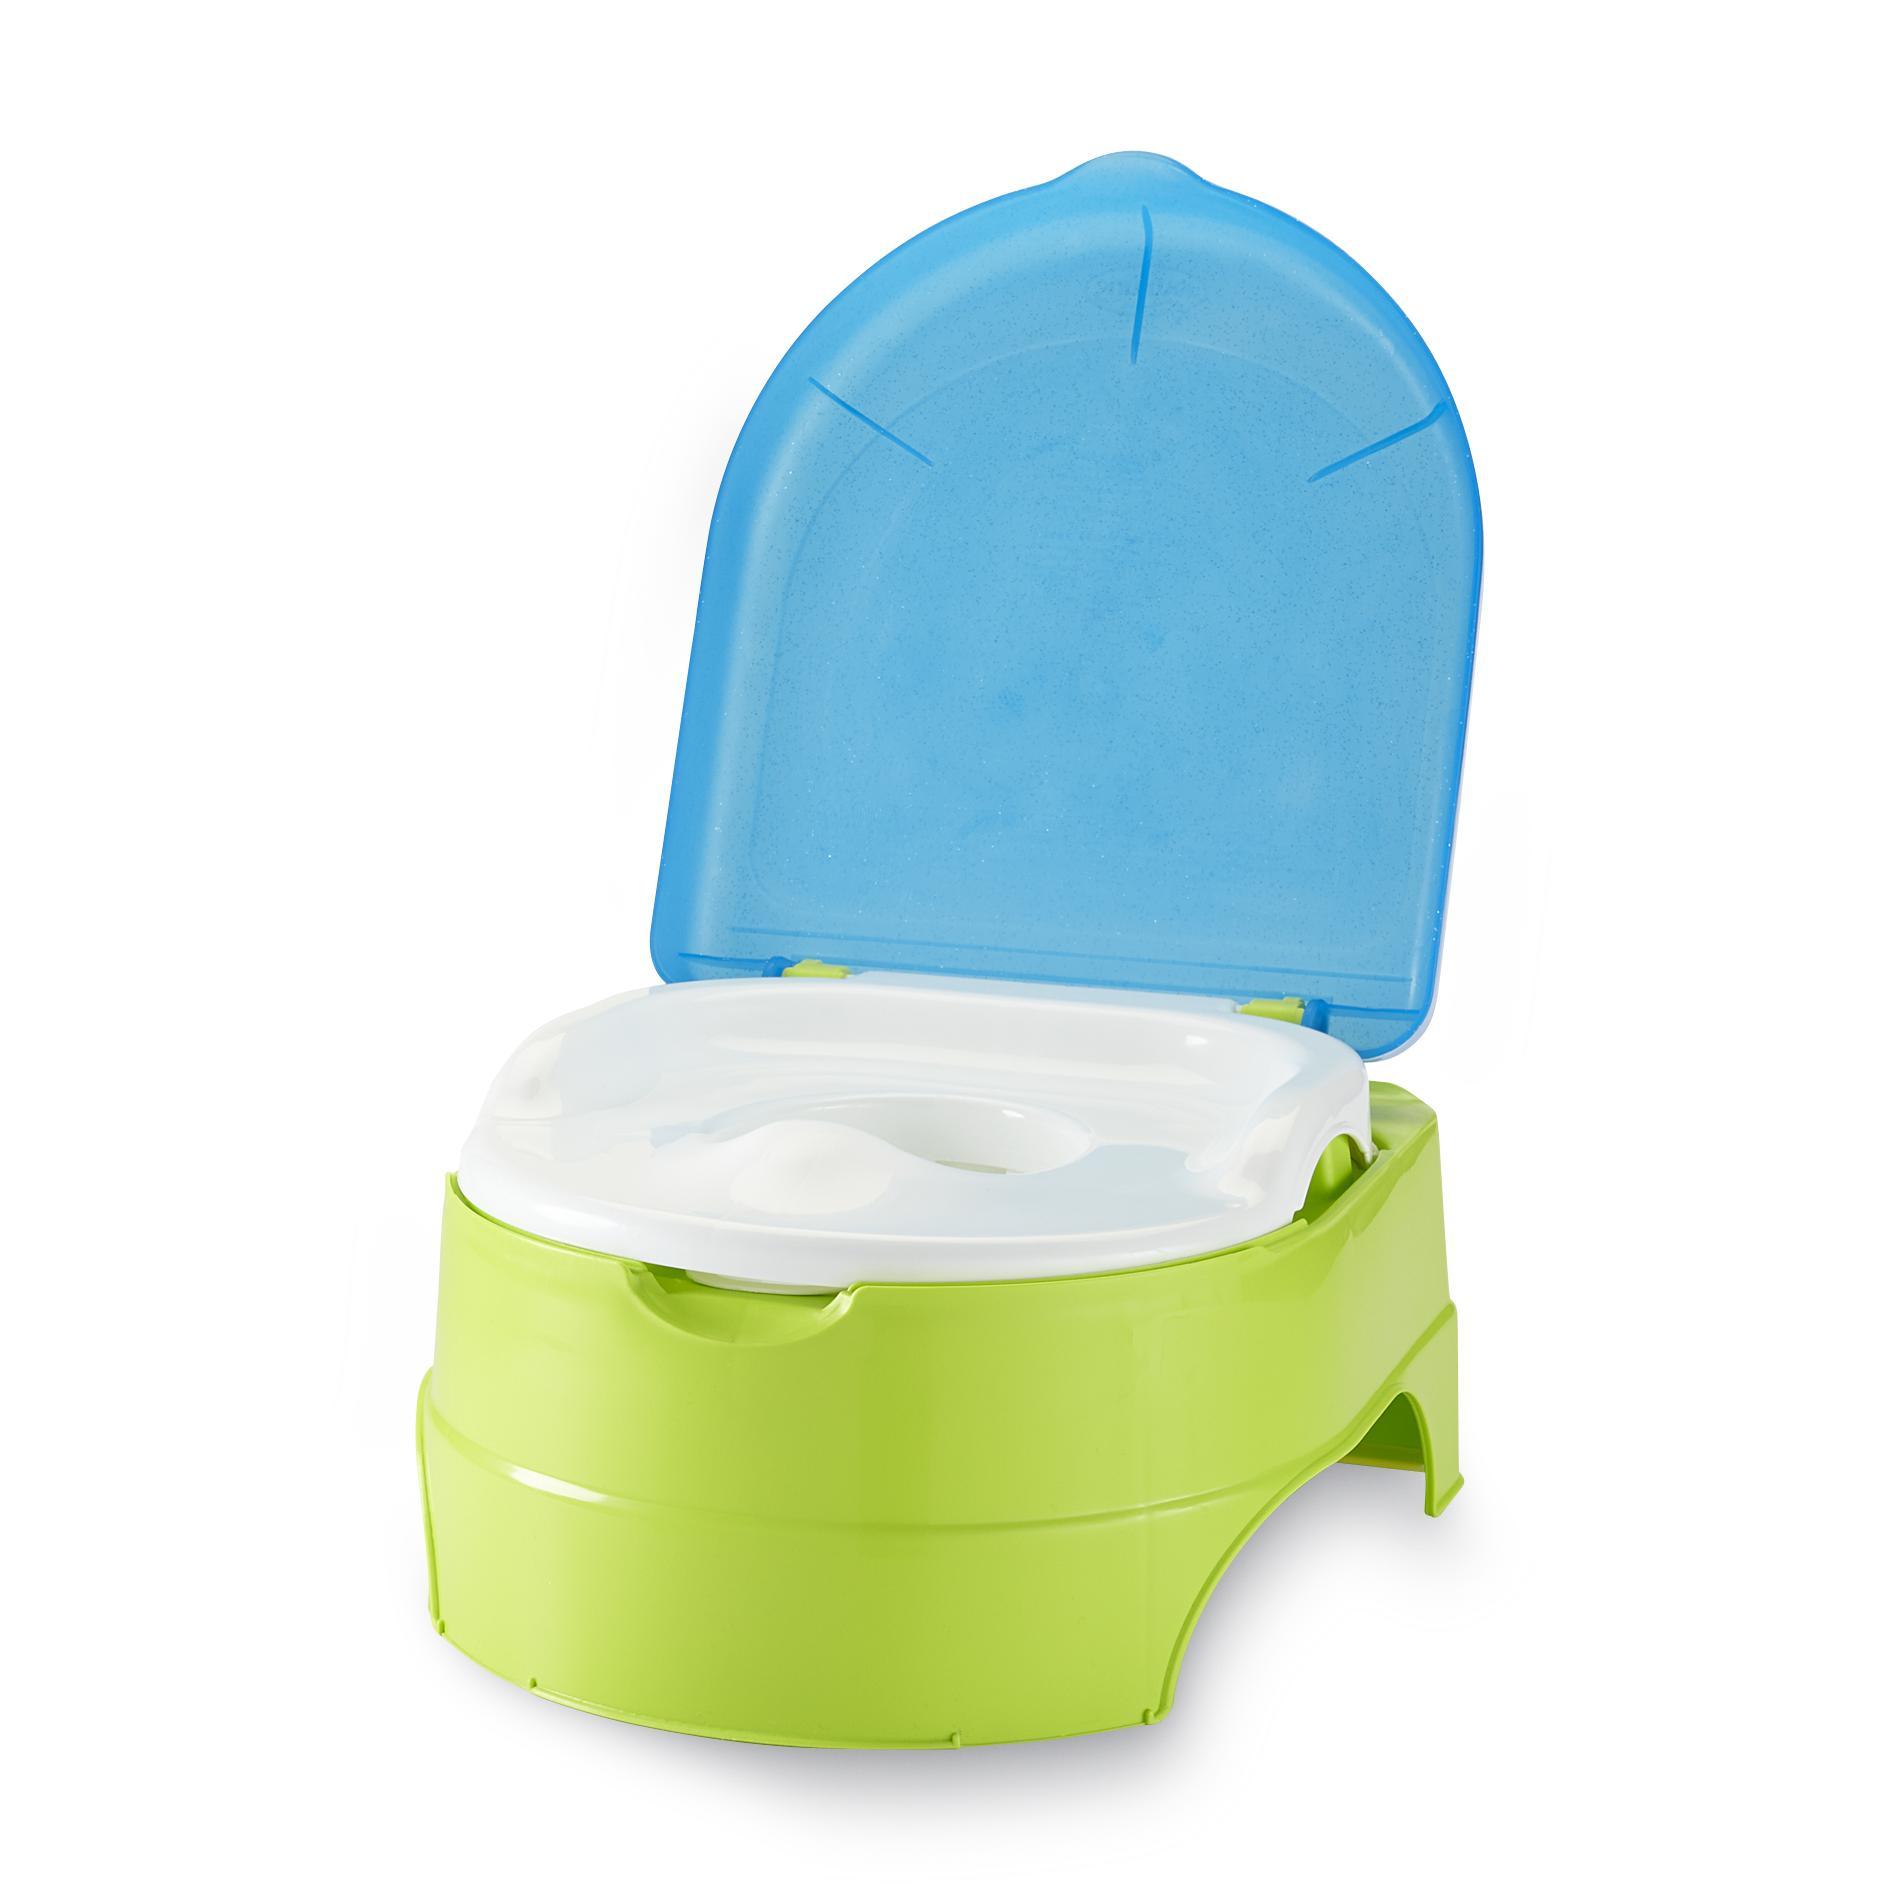 summer potty chair big wicker infants my fun convertible step stool